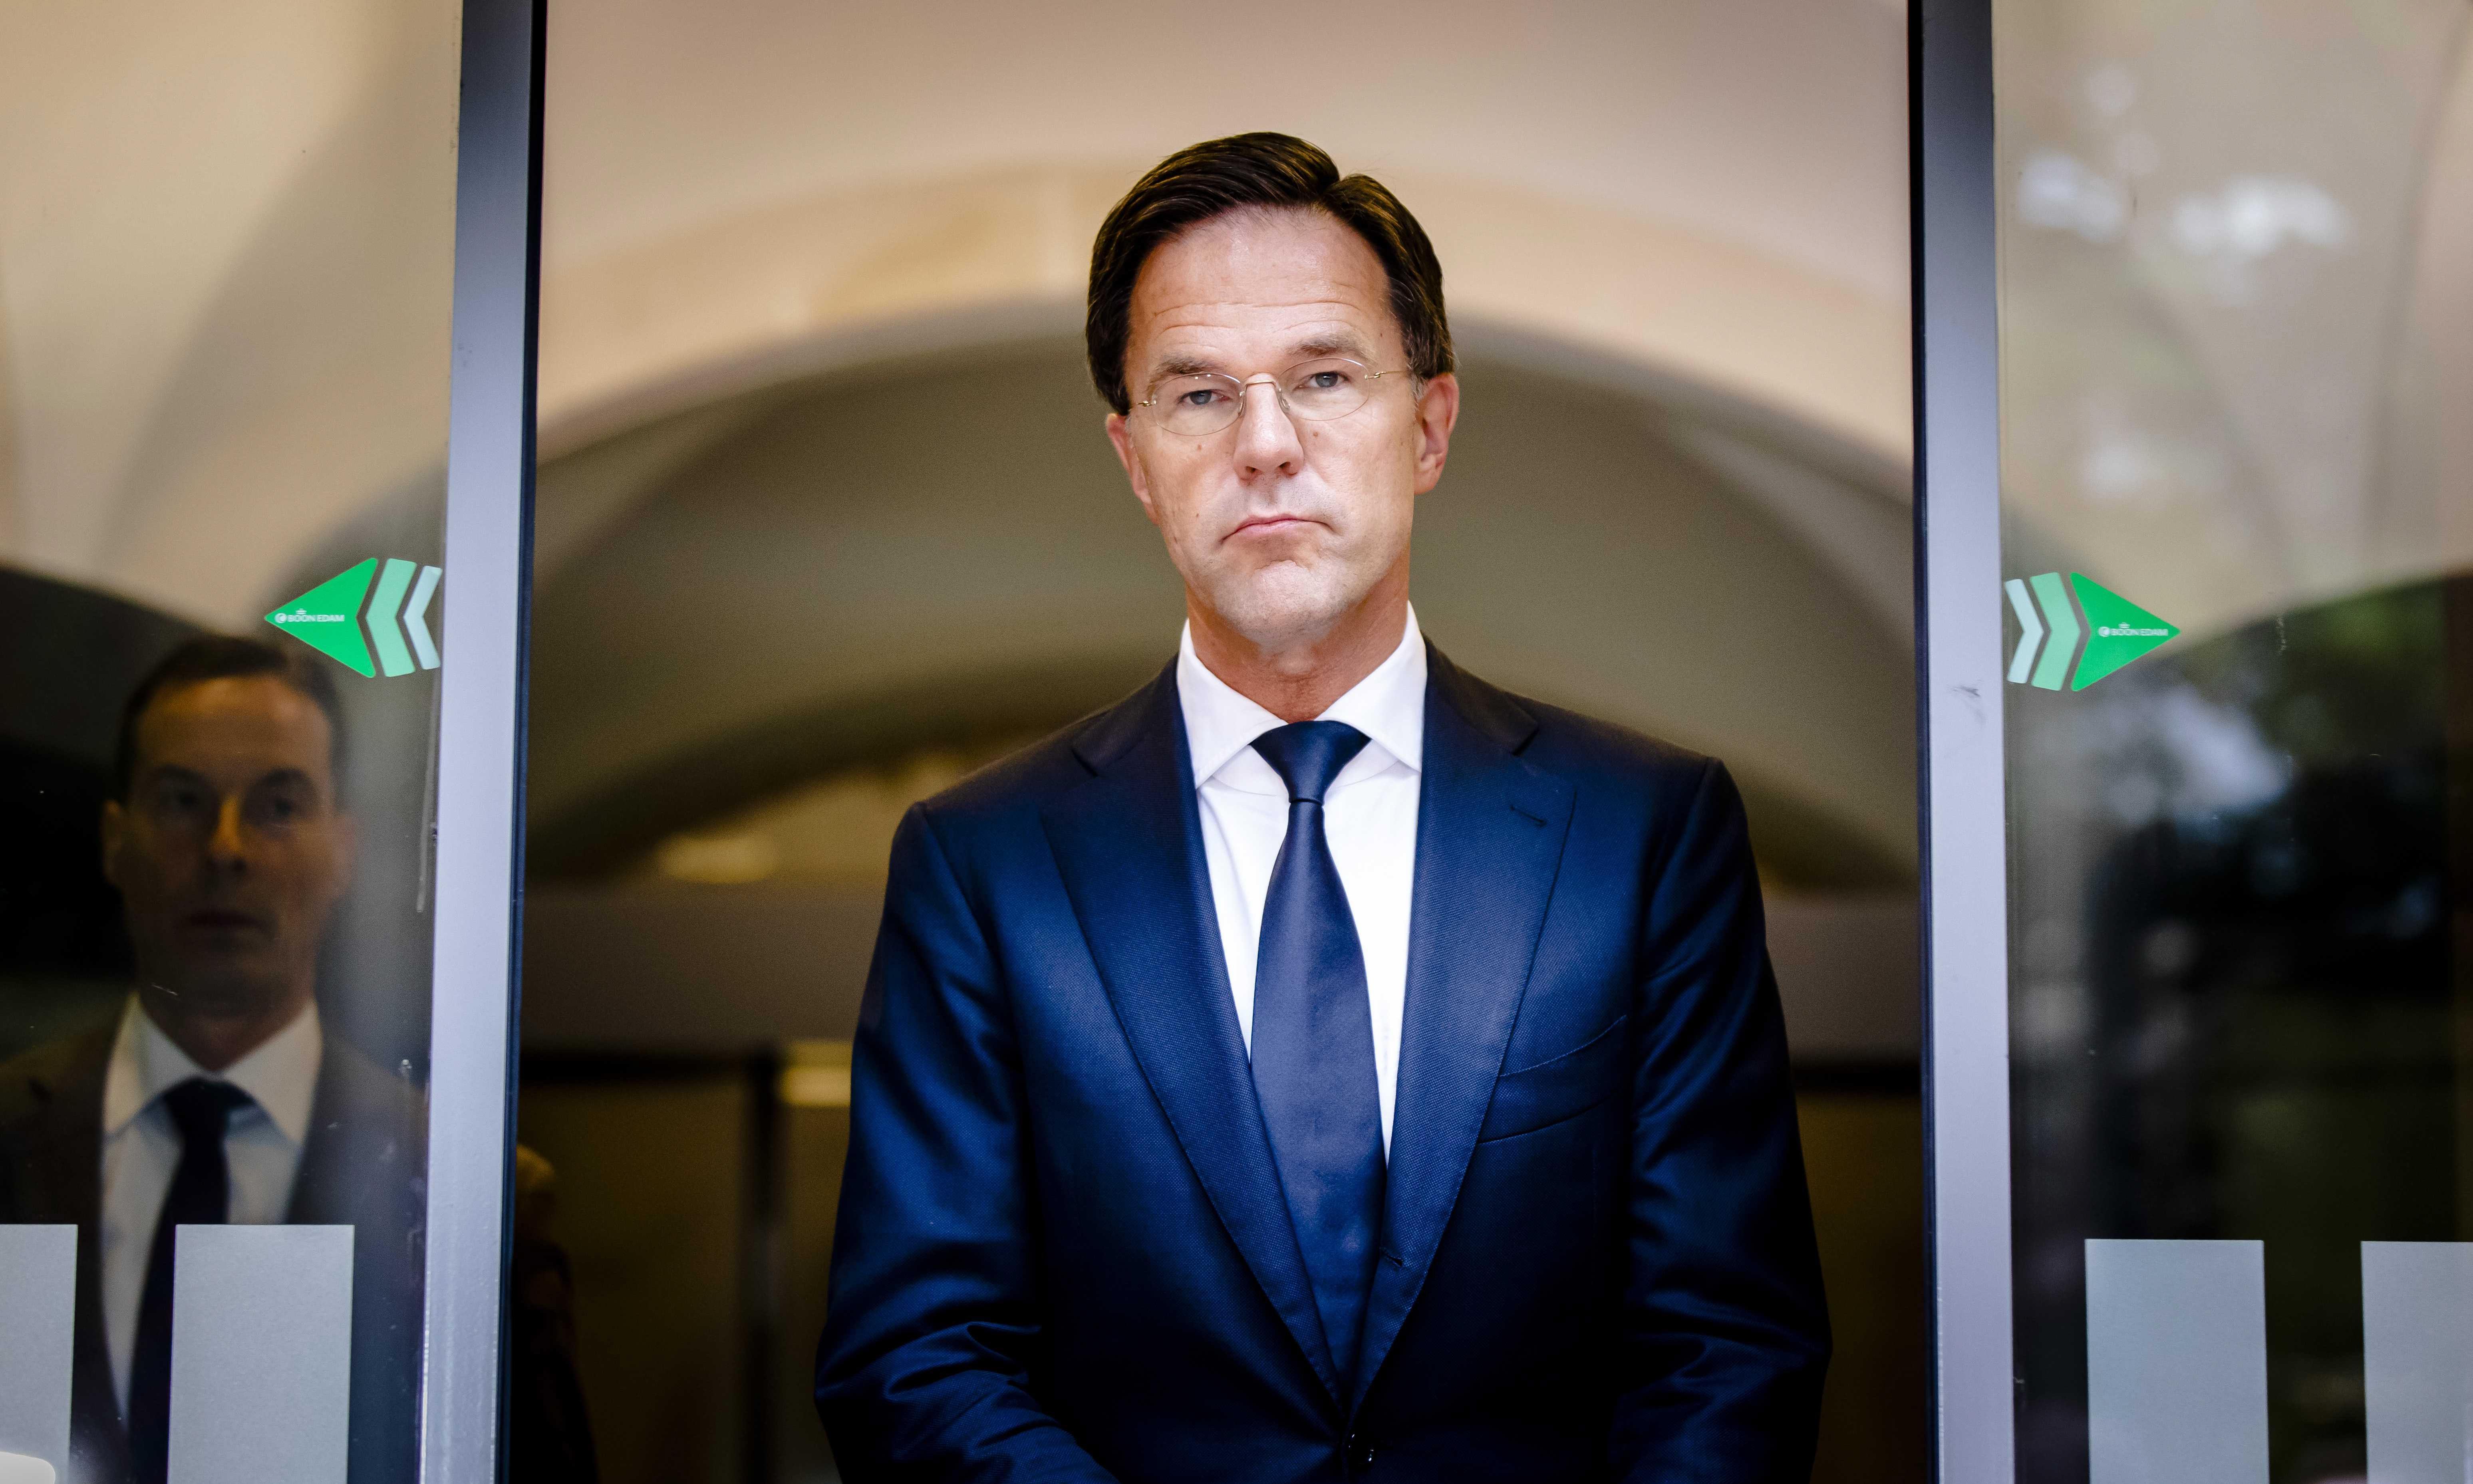 EU won't negotiate on Boris Johnson's Brexit plan, says Dutch PM